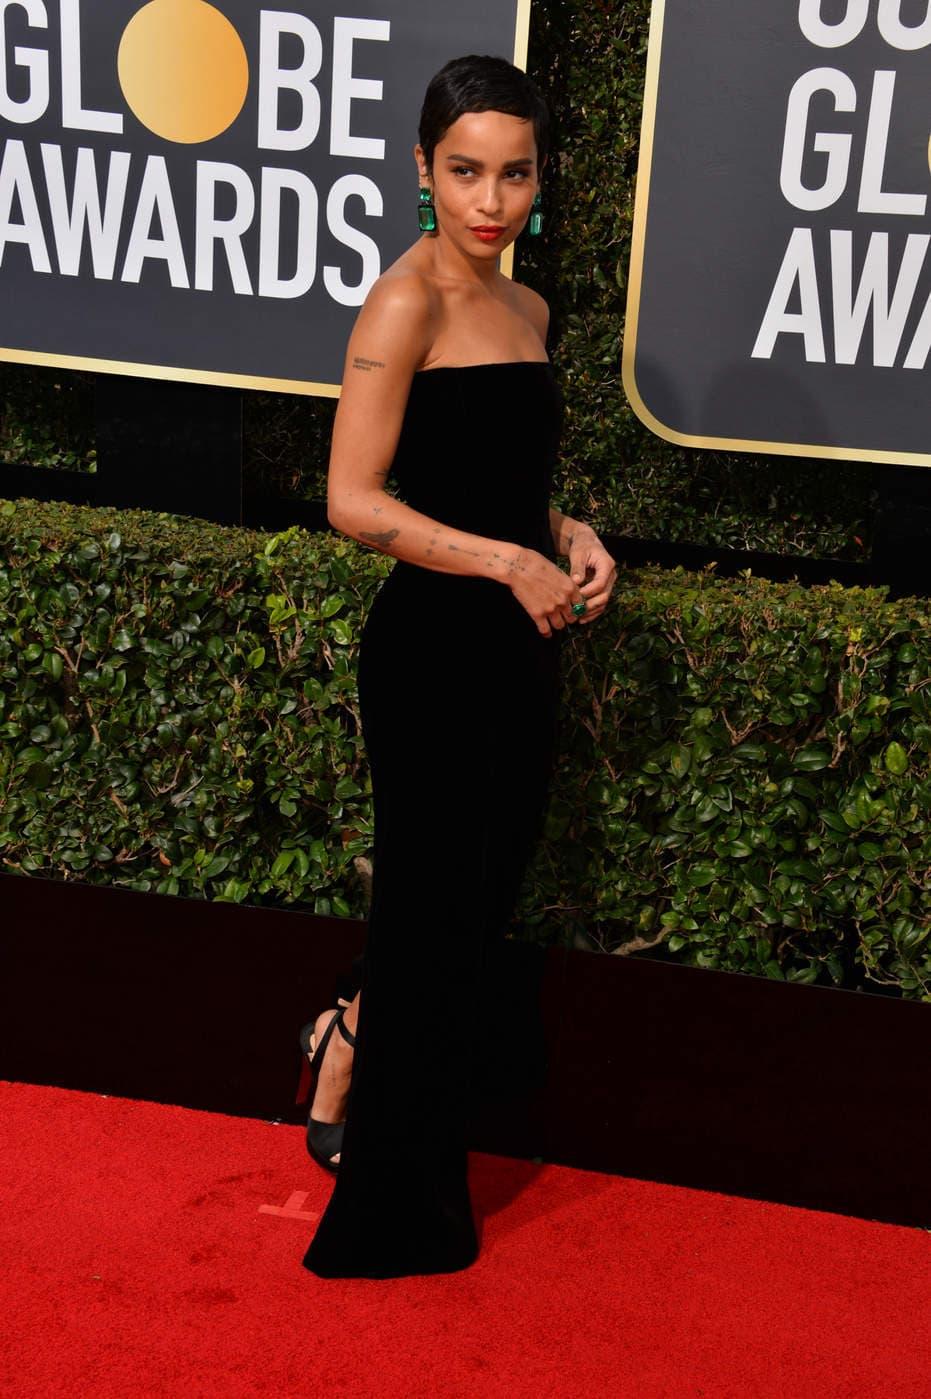 Zoe Kravitz in a black sleeveless Saint Laurent gown at the 2018 Golden Globe Awards red carpet